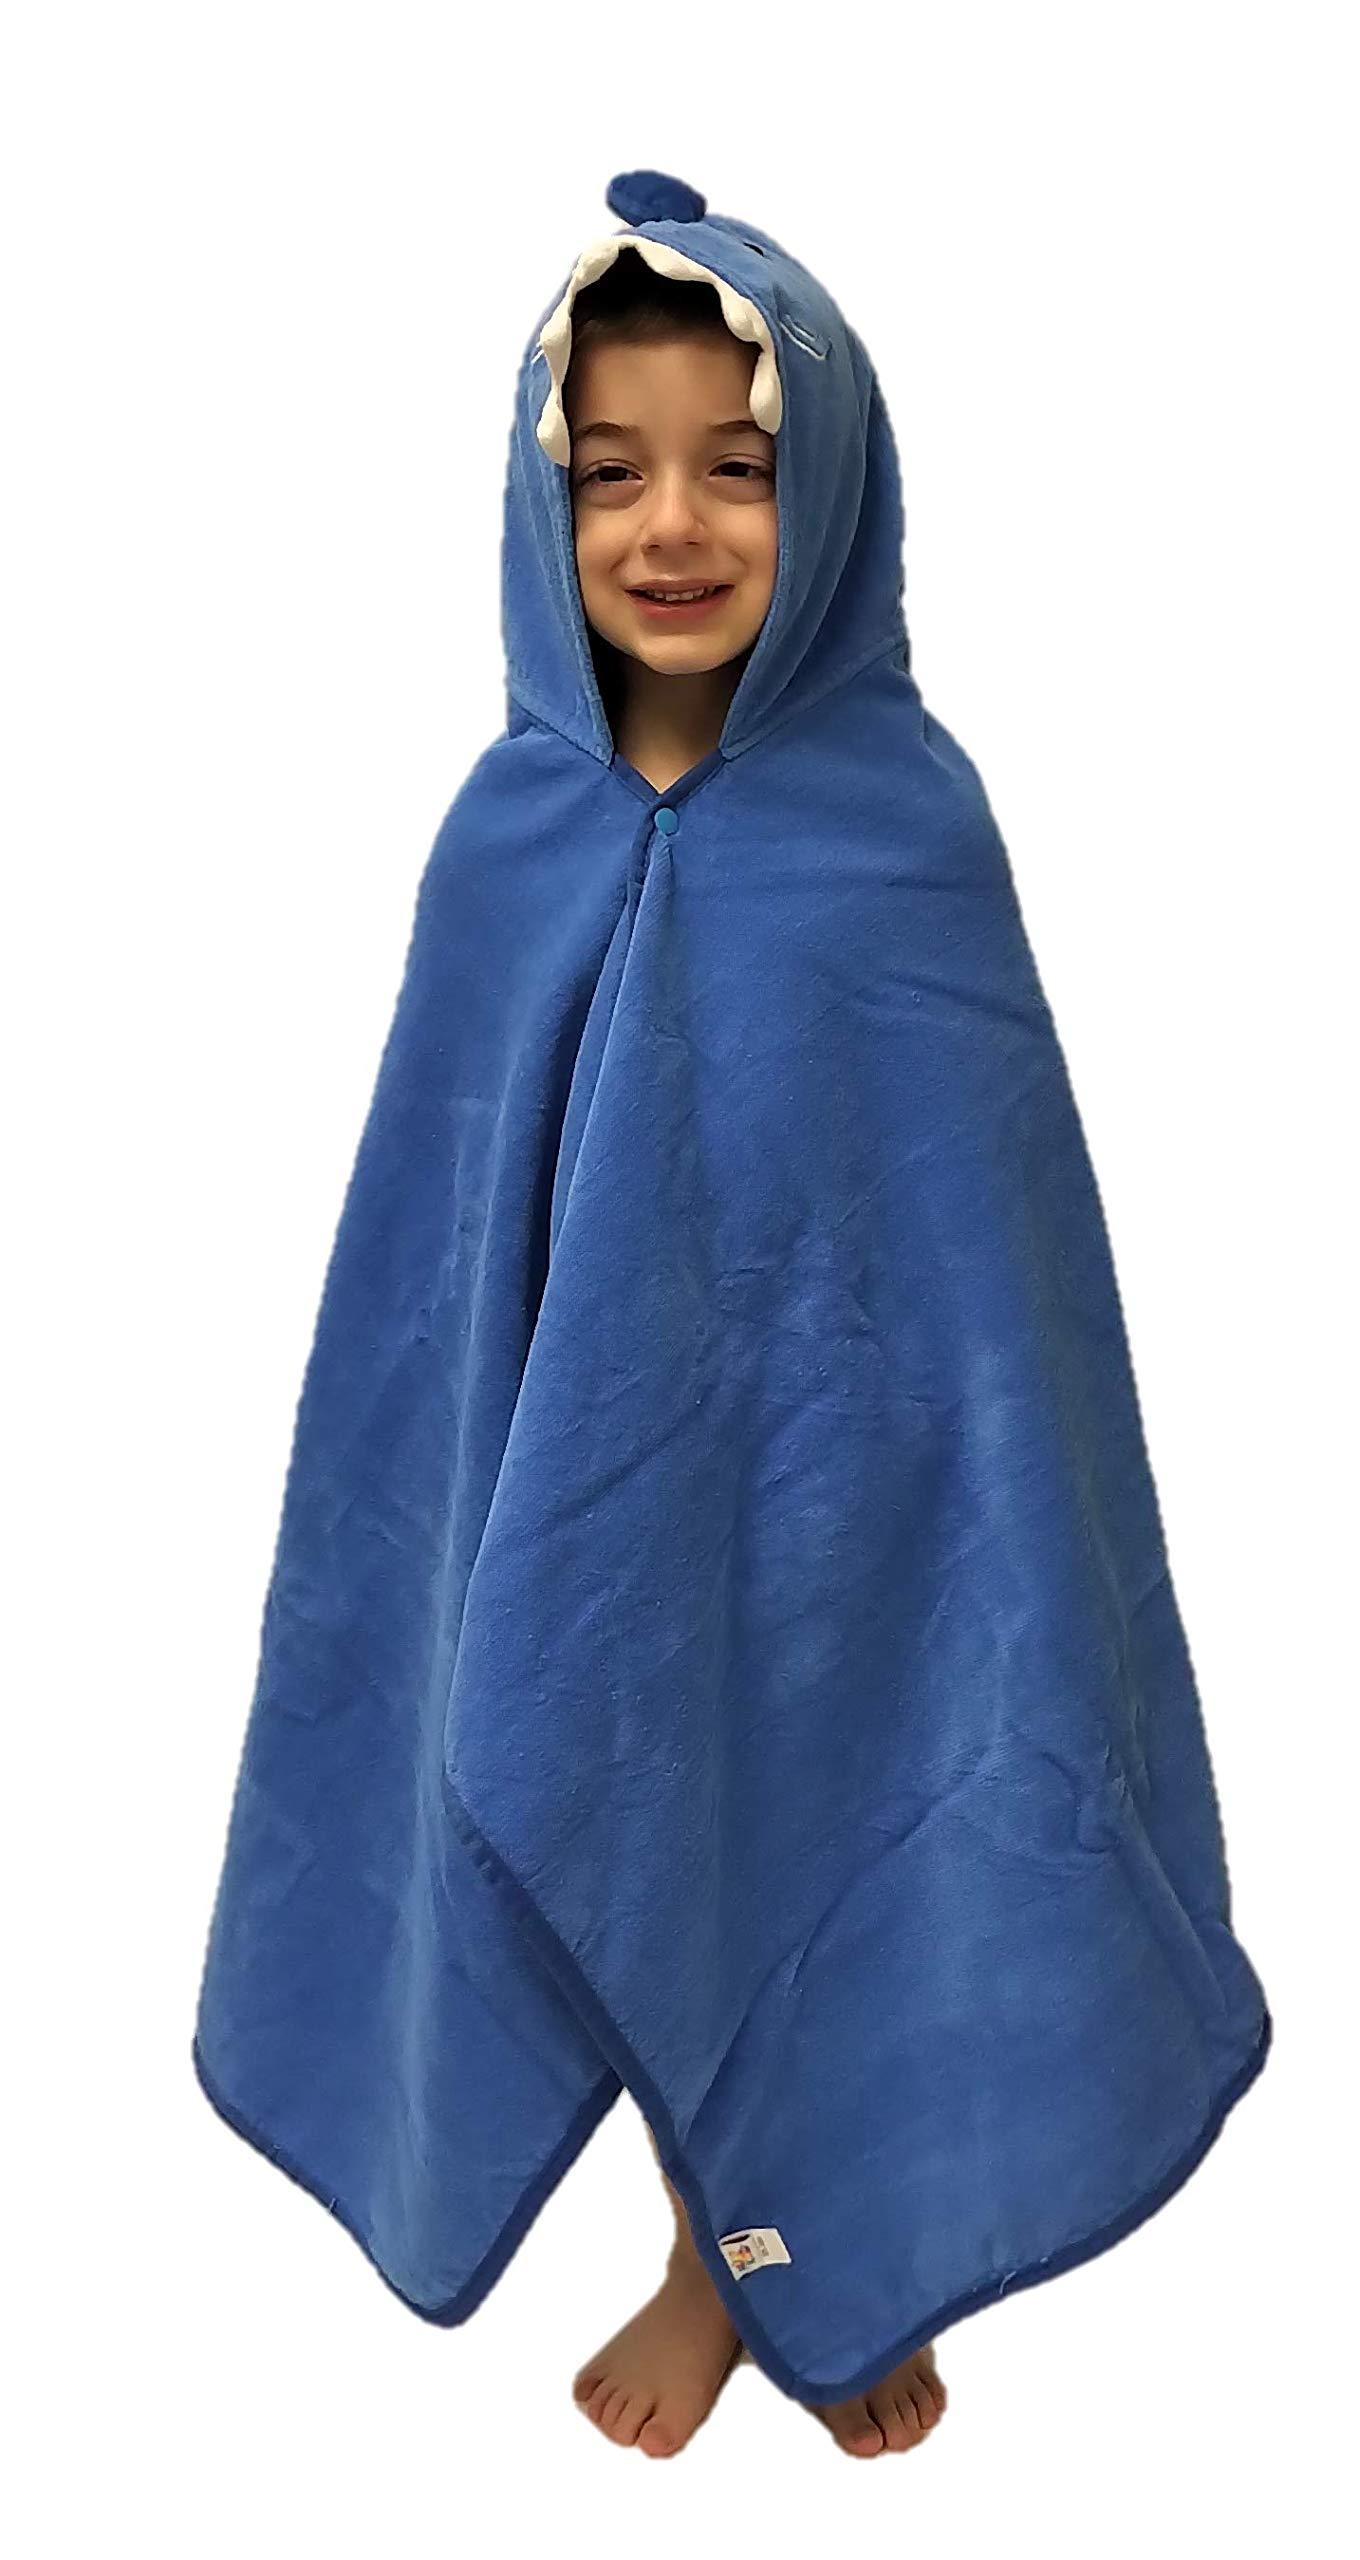 Hudz Kidz Softest Quick Dry Hooded Kids Shark Towel for Toddler - 5T - 100% Cotton Gently Snuggles Kids Dry. Get The Moms Love